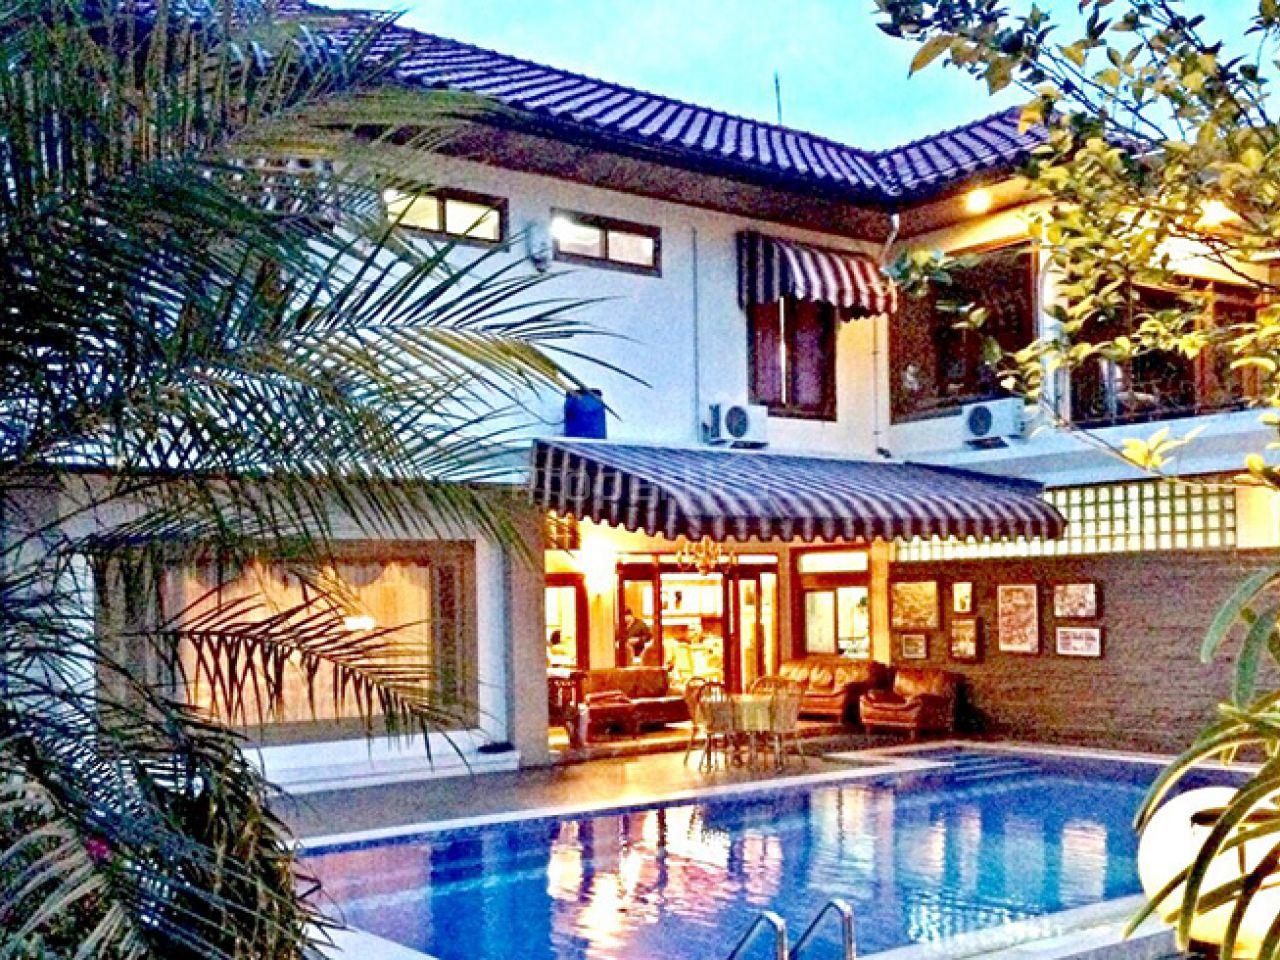 Luxury House with Swimming Pool in Gegerkalong, Jawa Barat